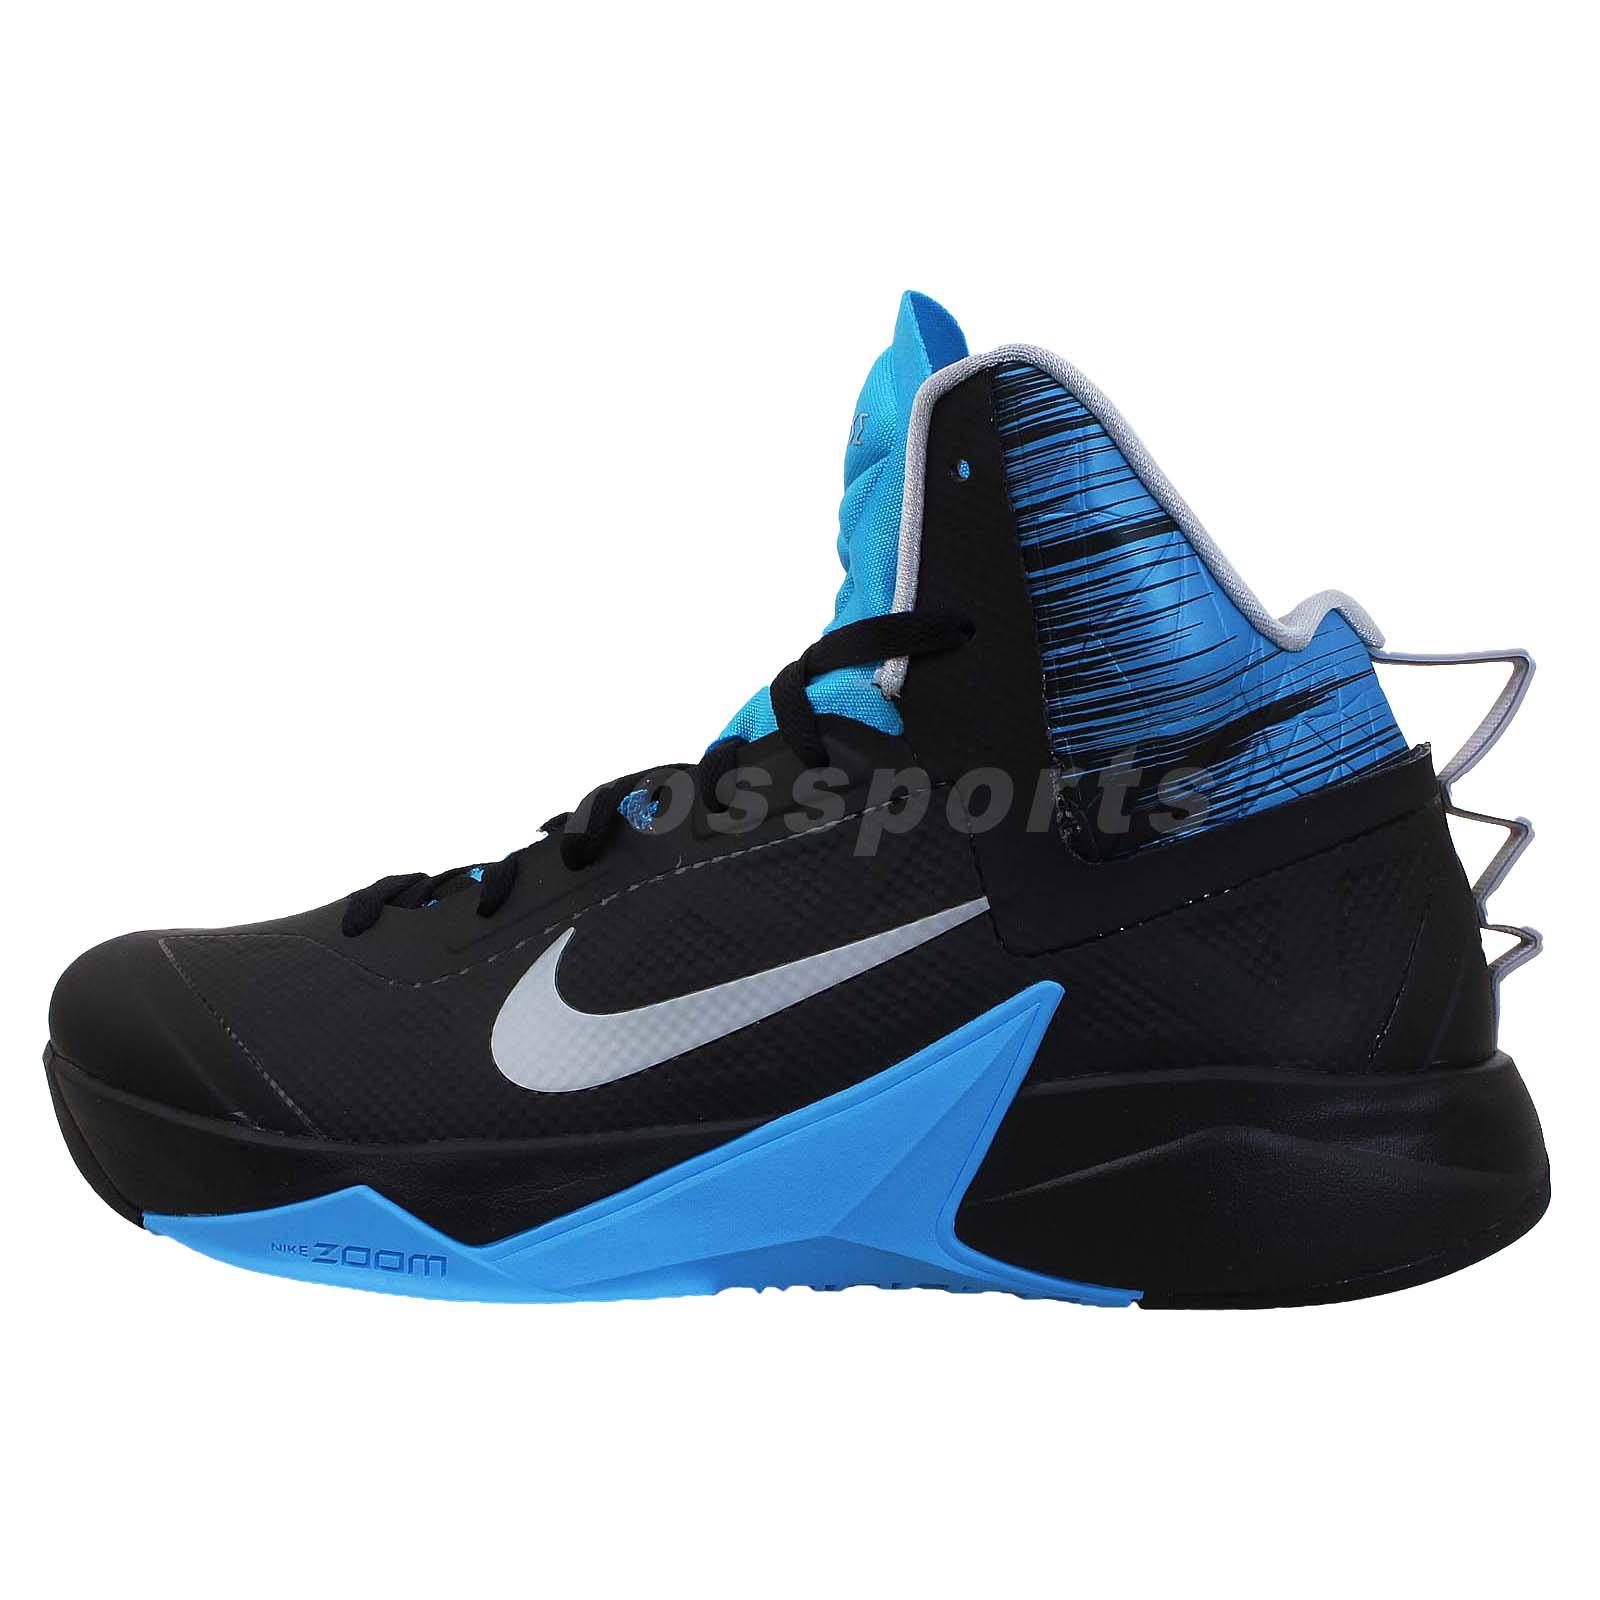 Nike Zoom Hyperfuse 2013 XDR Black Blue Mens Basketball ...